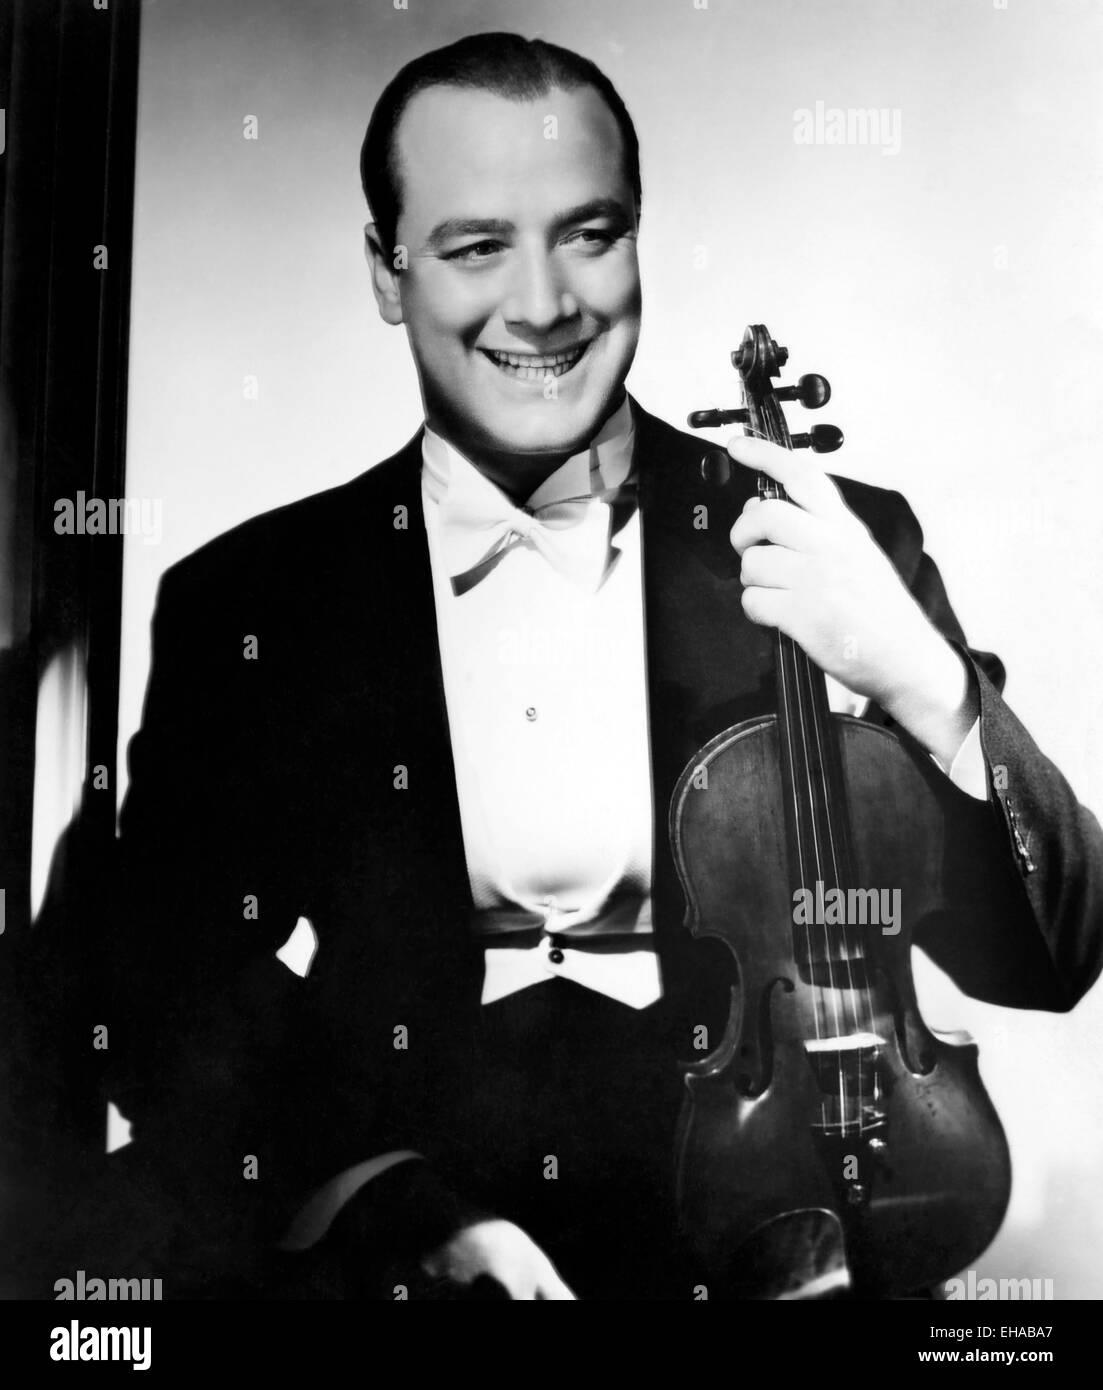 Joe Venuti, Smiling Portrait with Violin, circa 1940 - Stock Image